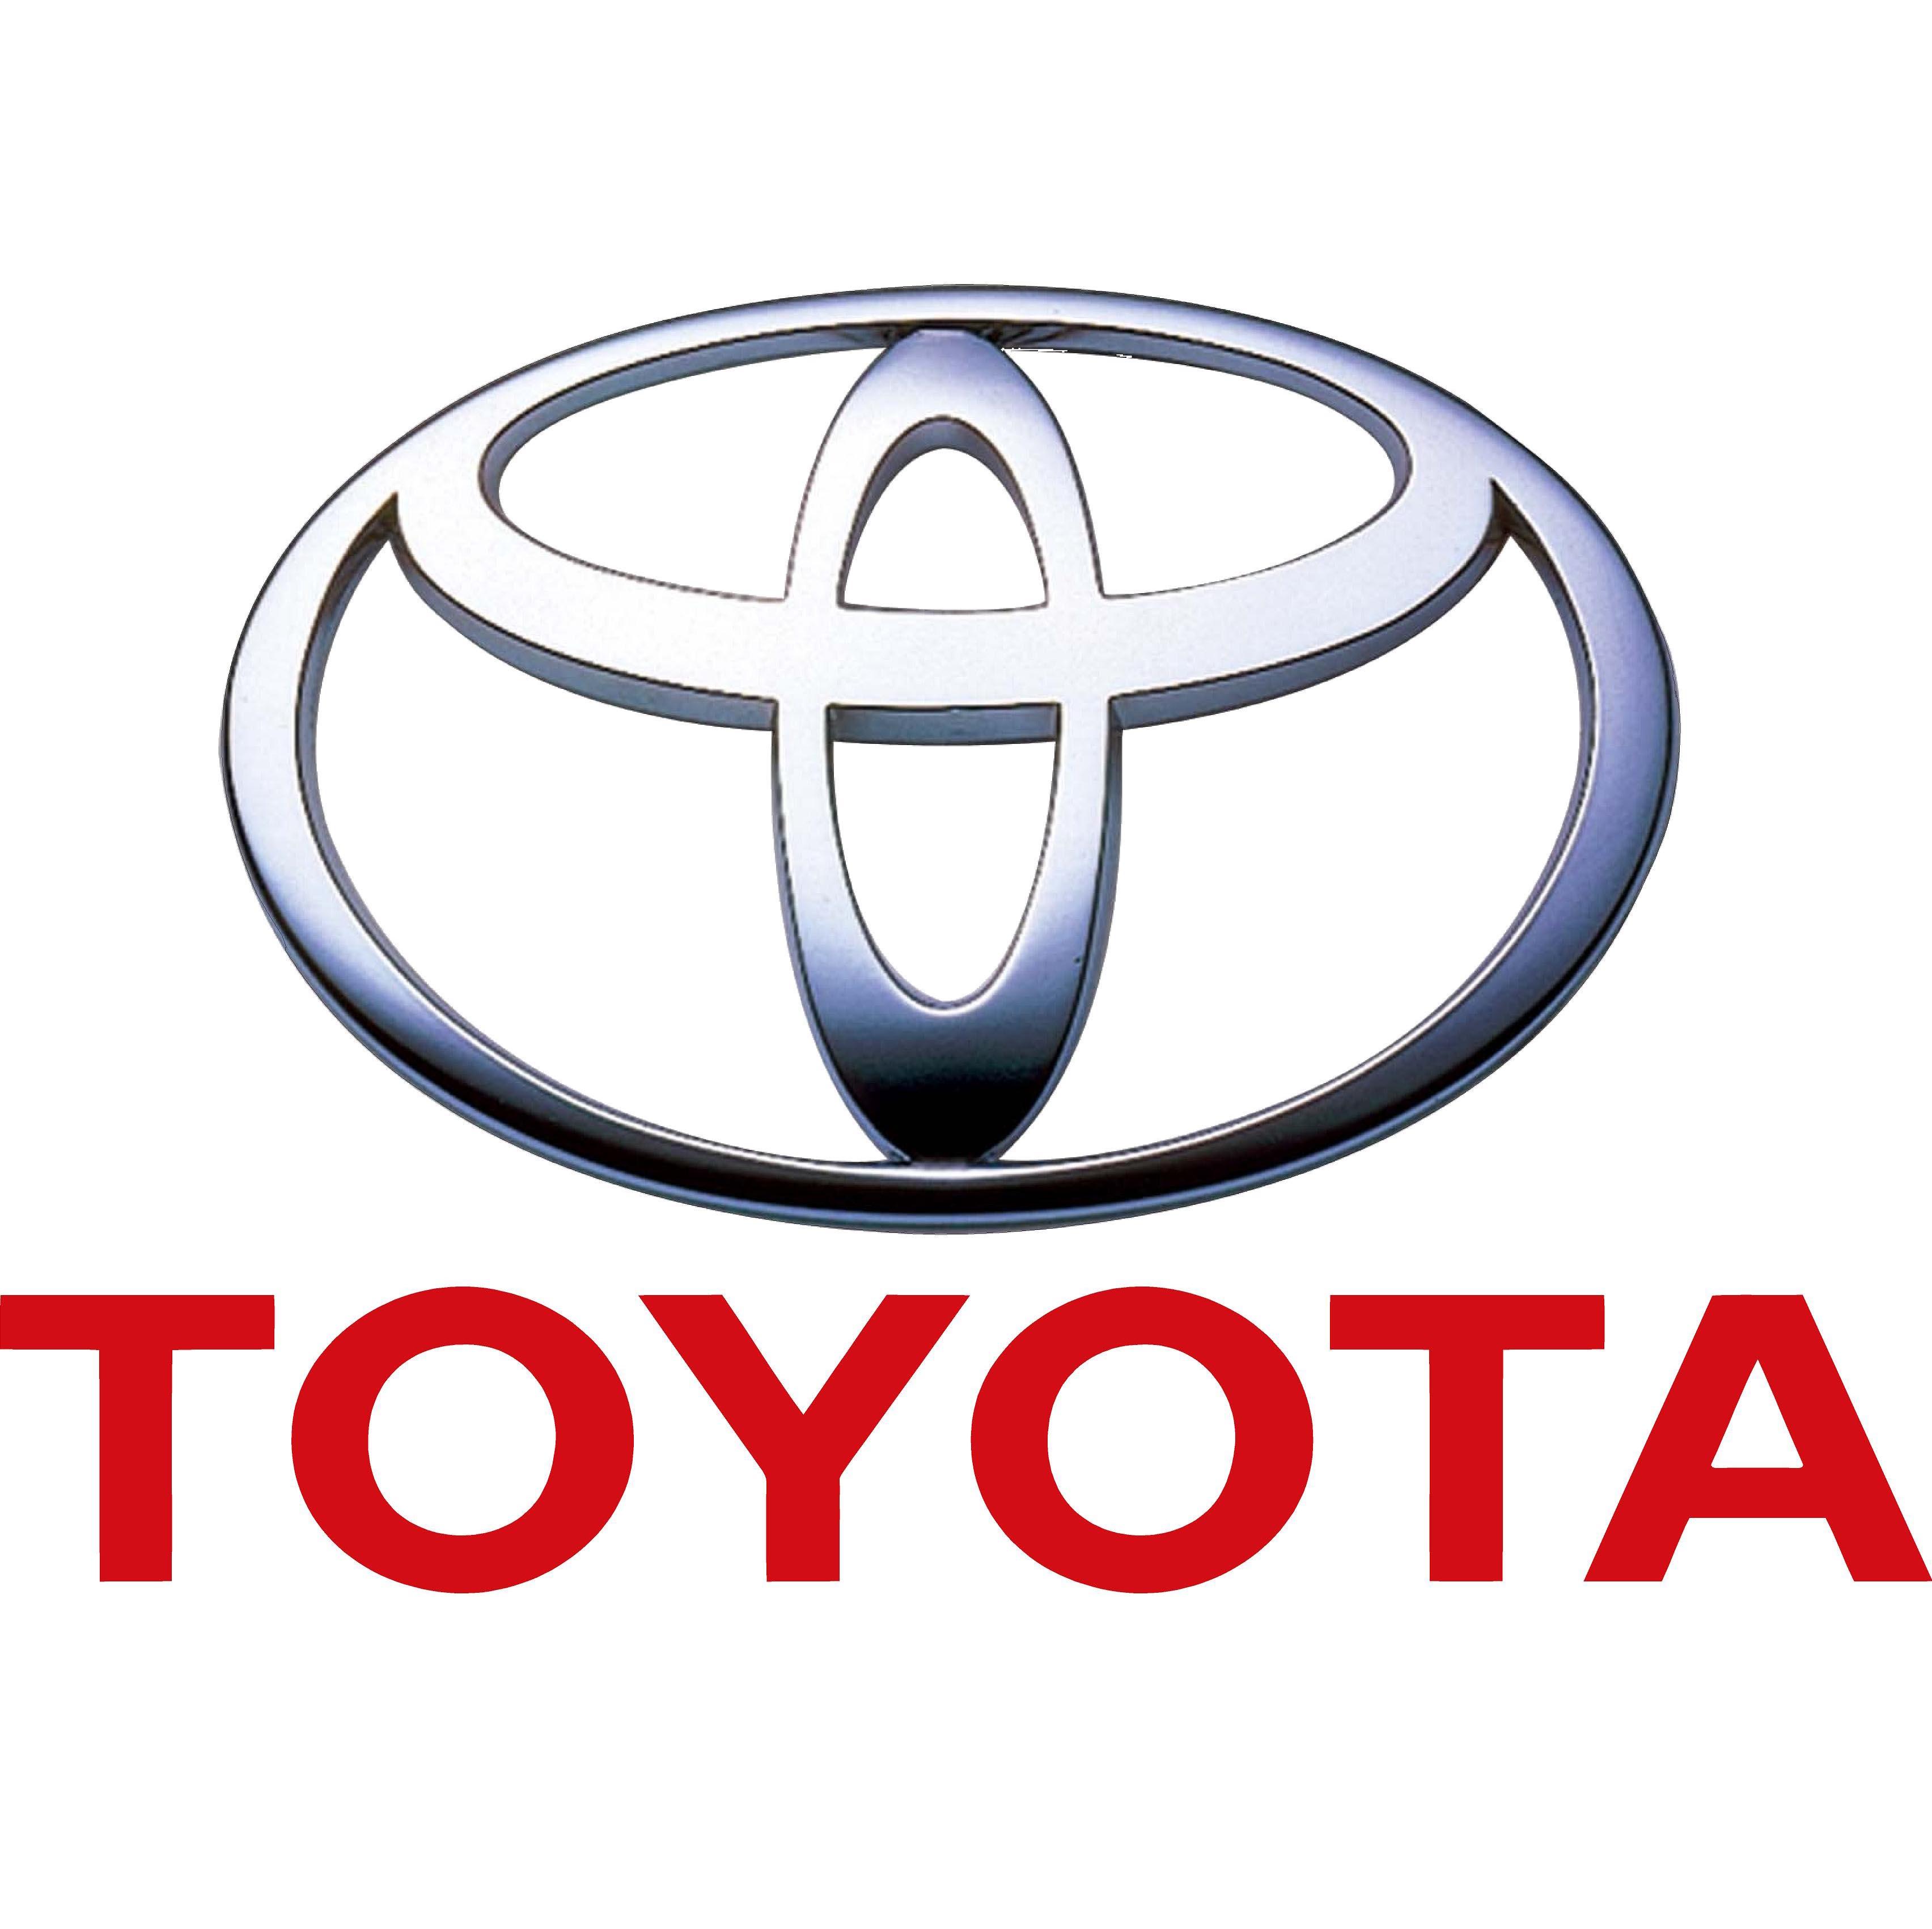 toyota-logo-png1.jpg